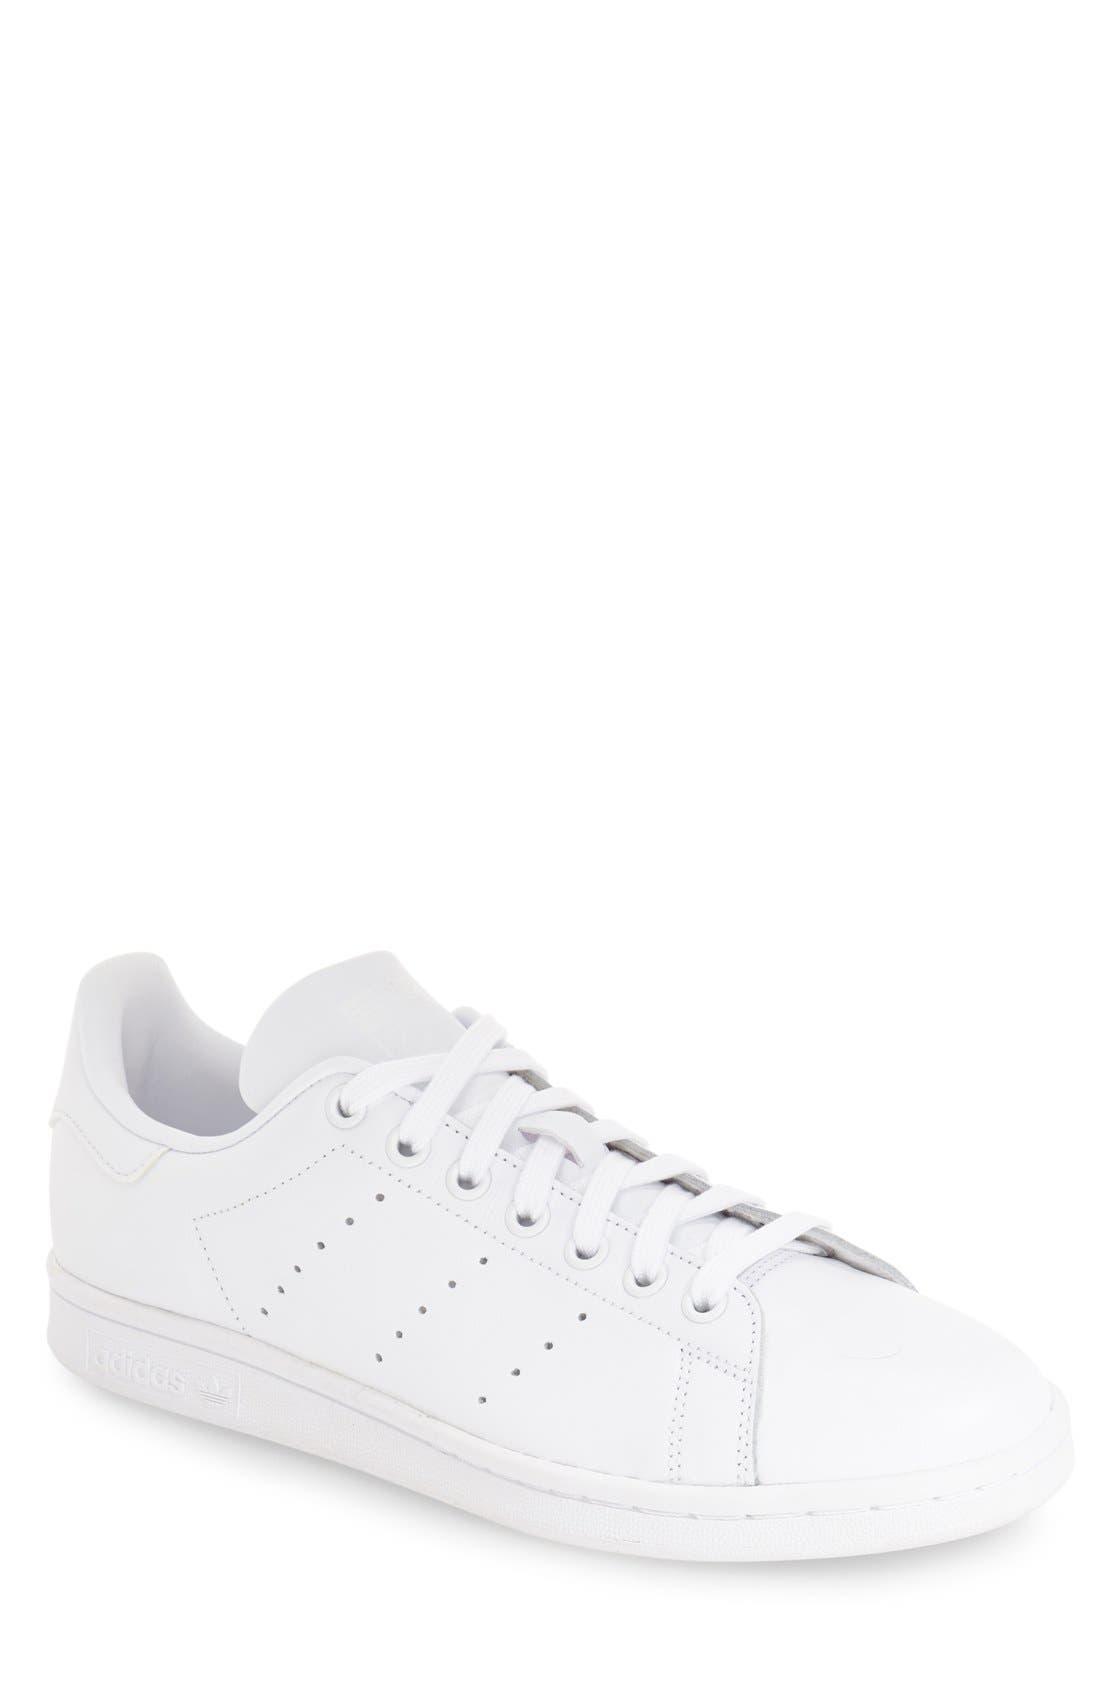 Main Image - adidas \u0027Stan Smith Eco\u0027 Sneaker (Men)